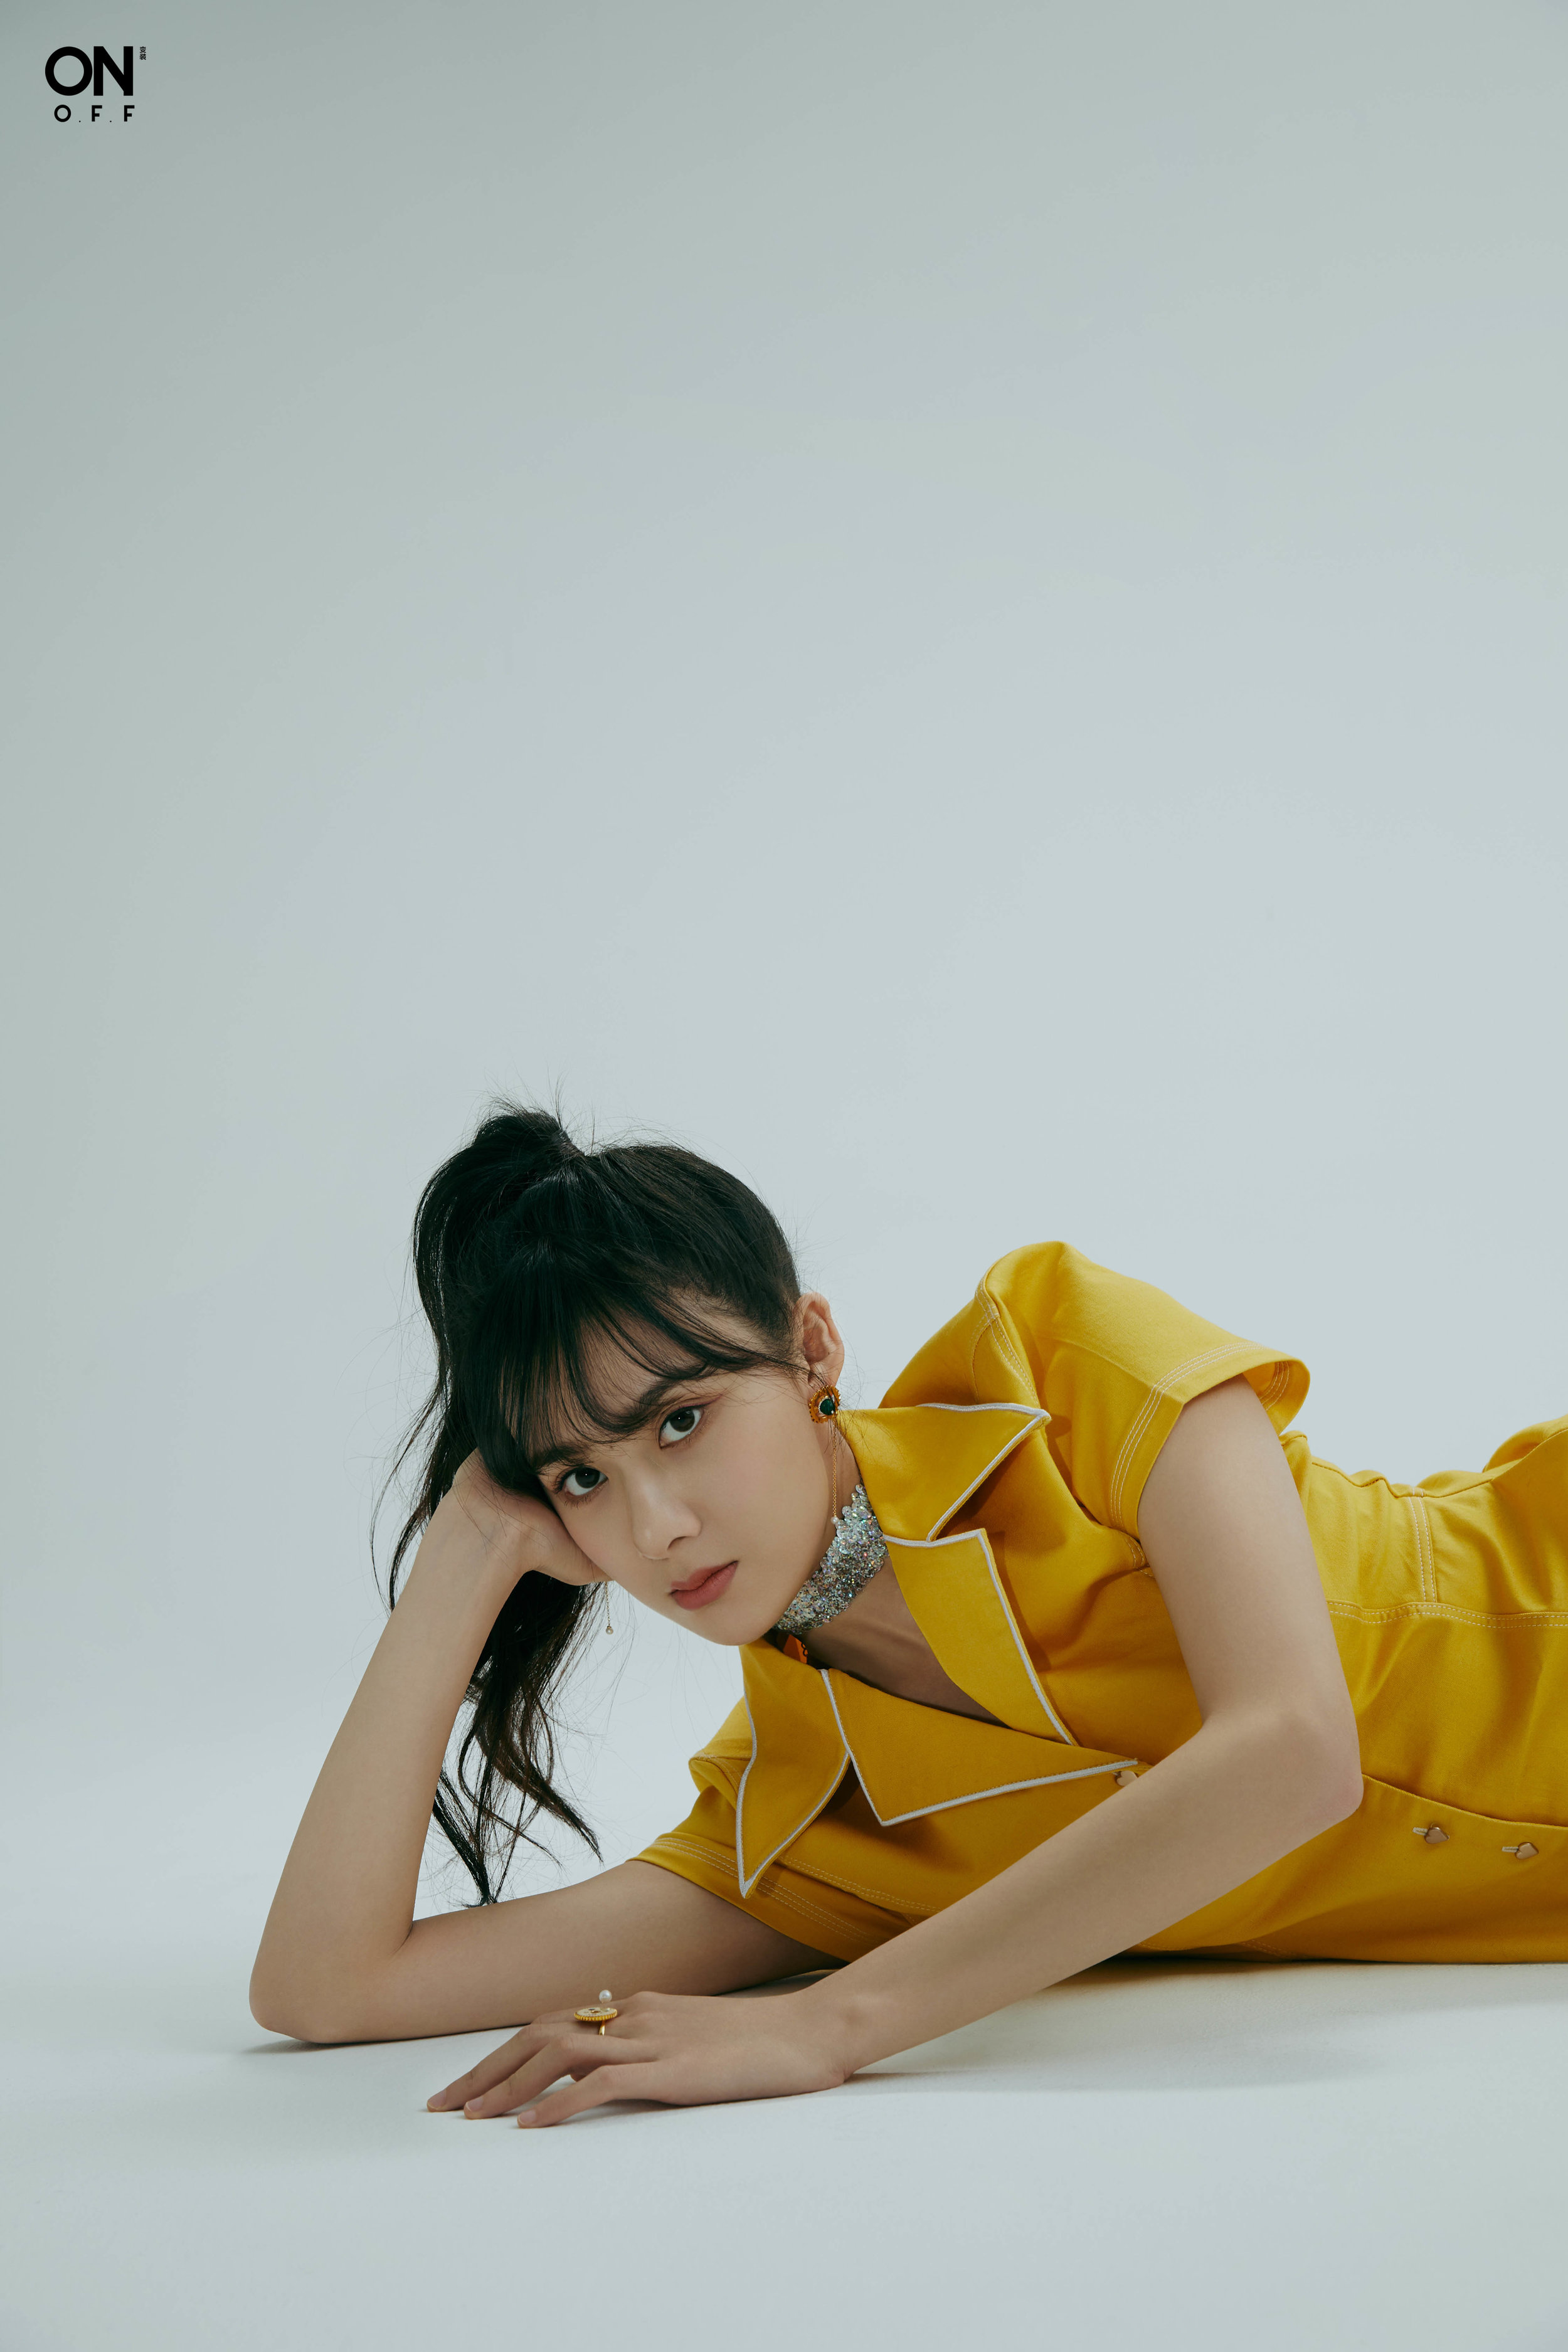 Date: January, 2019  Credit: Drunken Machine Gear Rings & Earrings  Country: China  Celebrity: Cao Xiyue